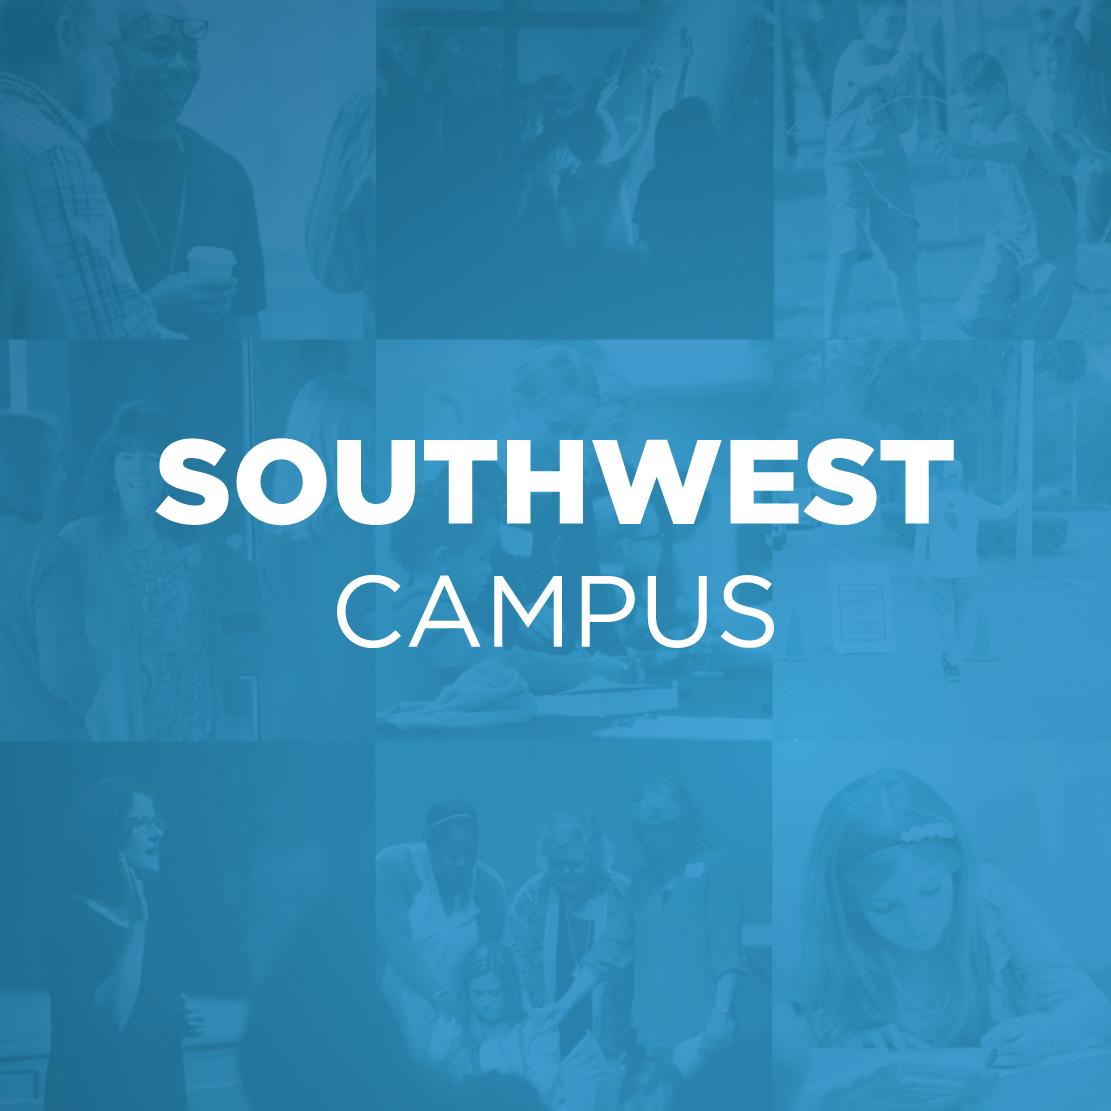 Southwetes-Campus.jpg